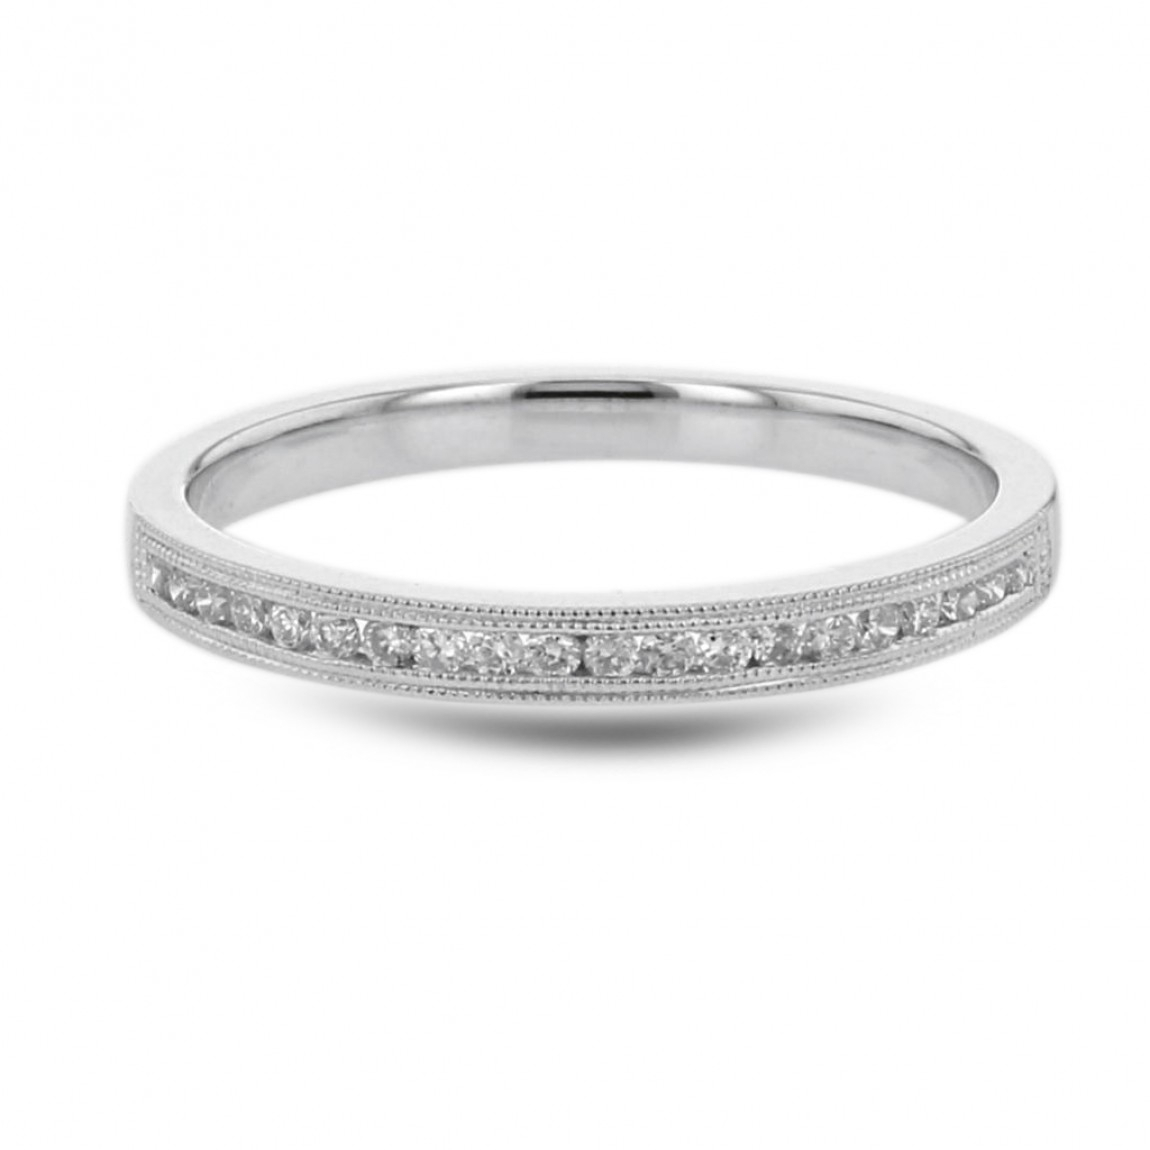 Diamond Wedding Anniversary Band, Milgrain Channel Ring, 14k White Gold, (View 17 of 25)